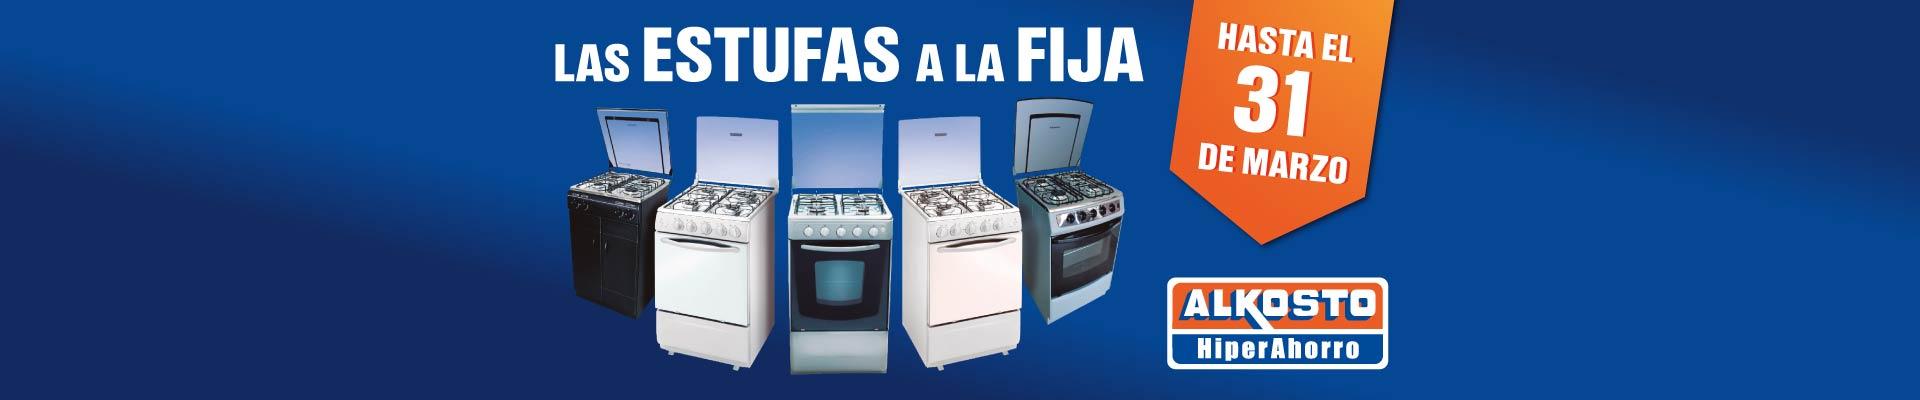 PPAL-AK-7-lb-estufas-a-la-fija-en-alkosto-cat-marzo21-23